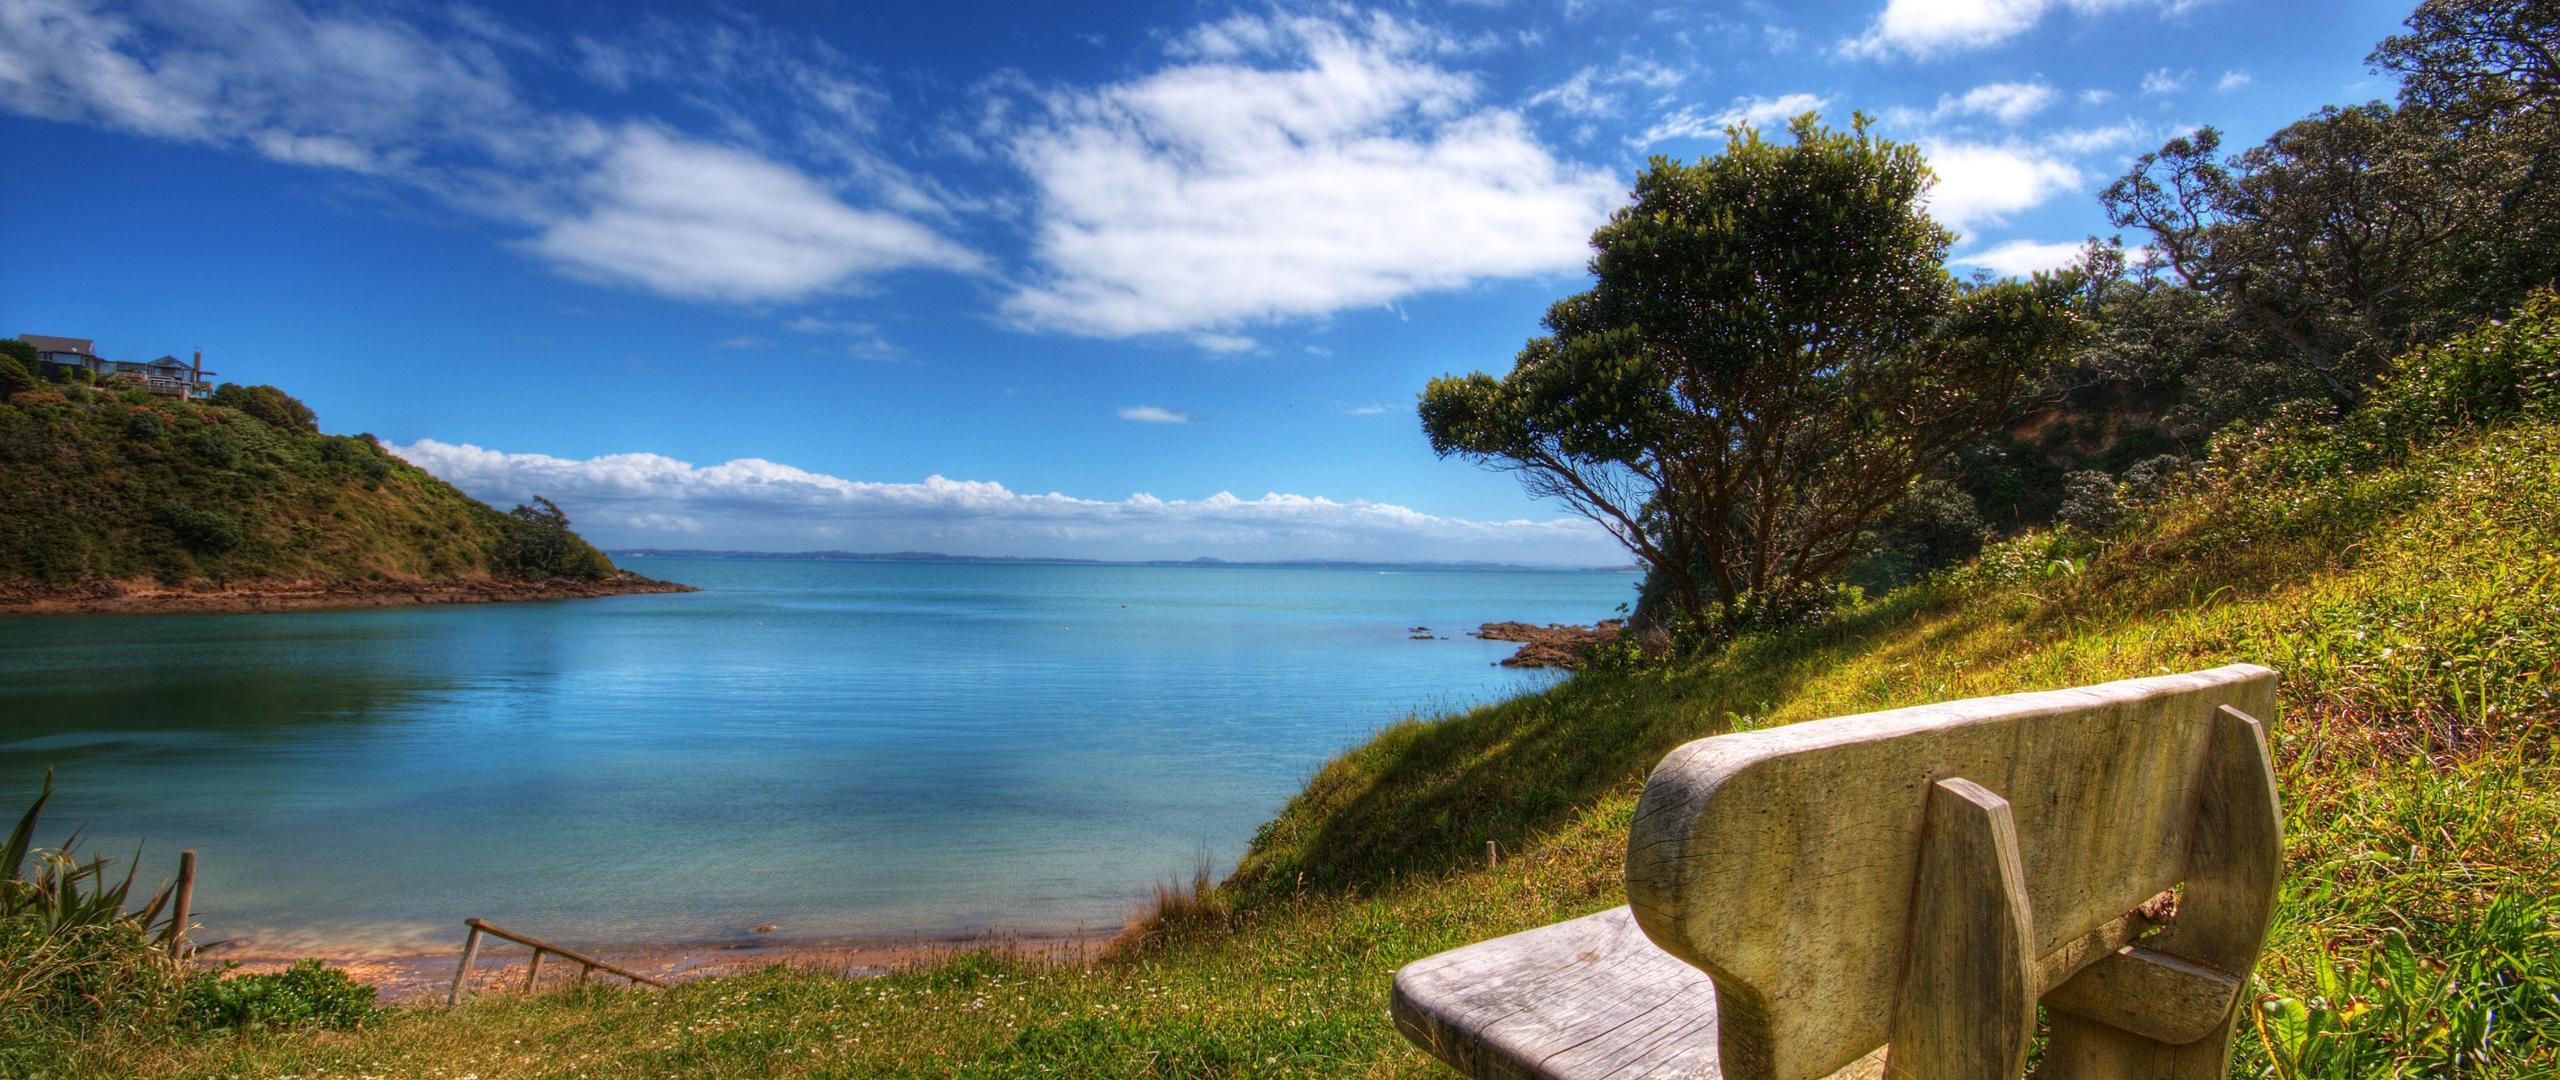 Download Wallpaper 2560x1080 Bench Sea Landscape Coast 2560x1080 21 2560x1080